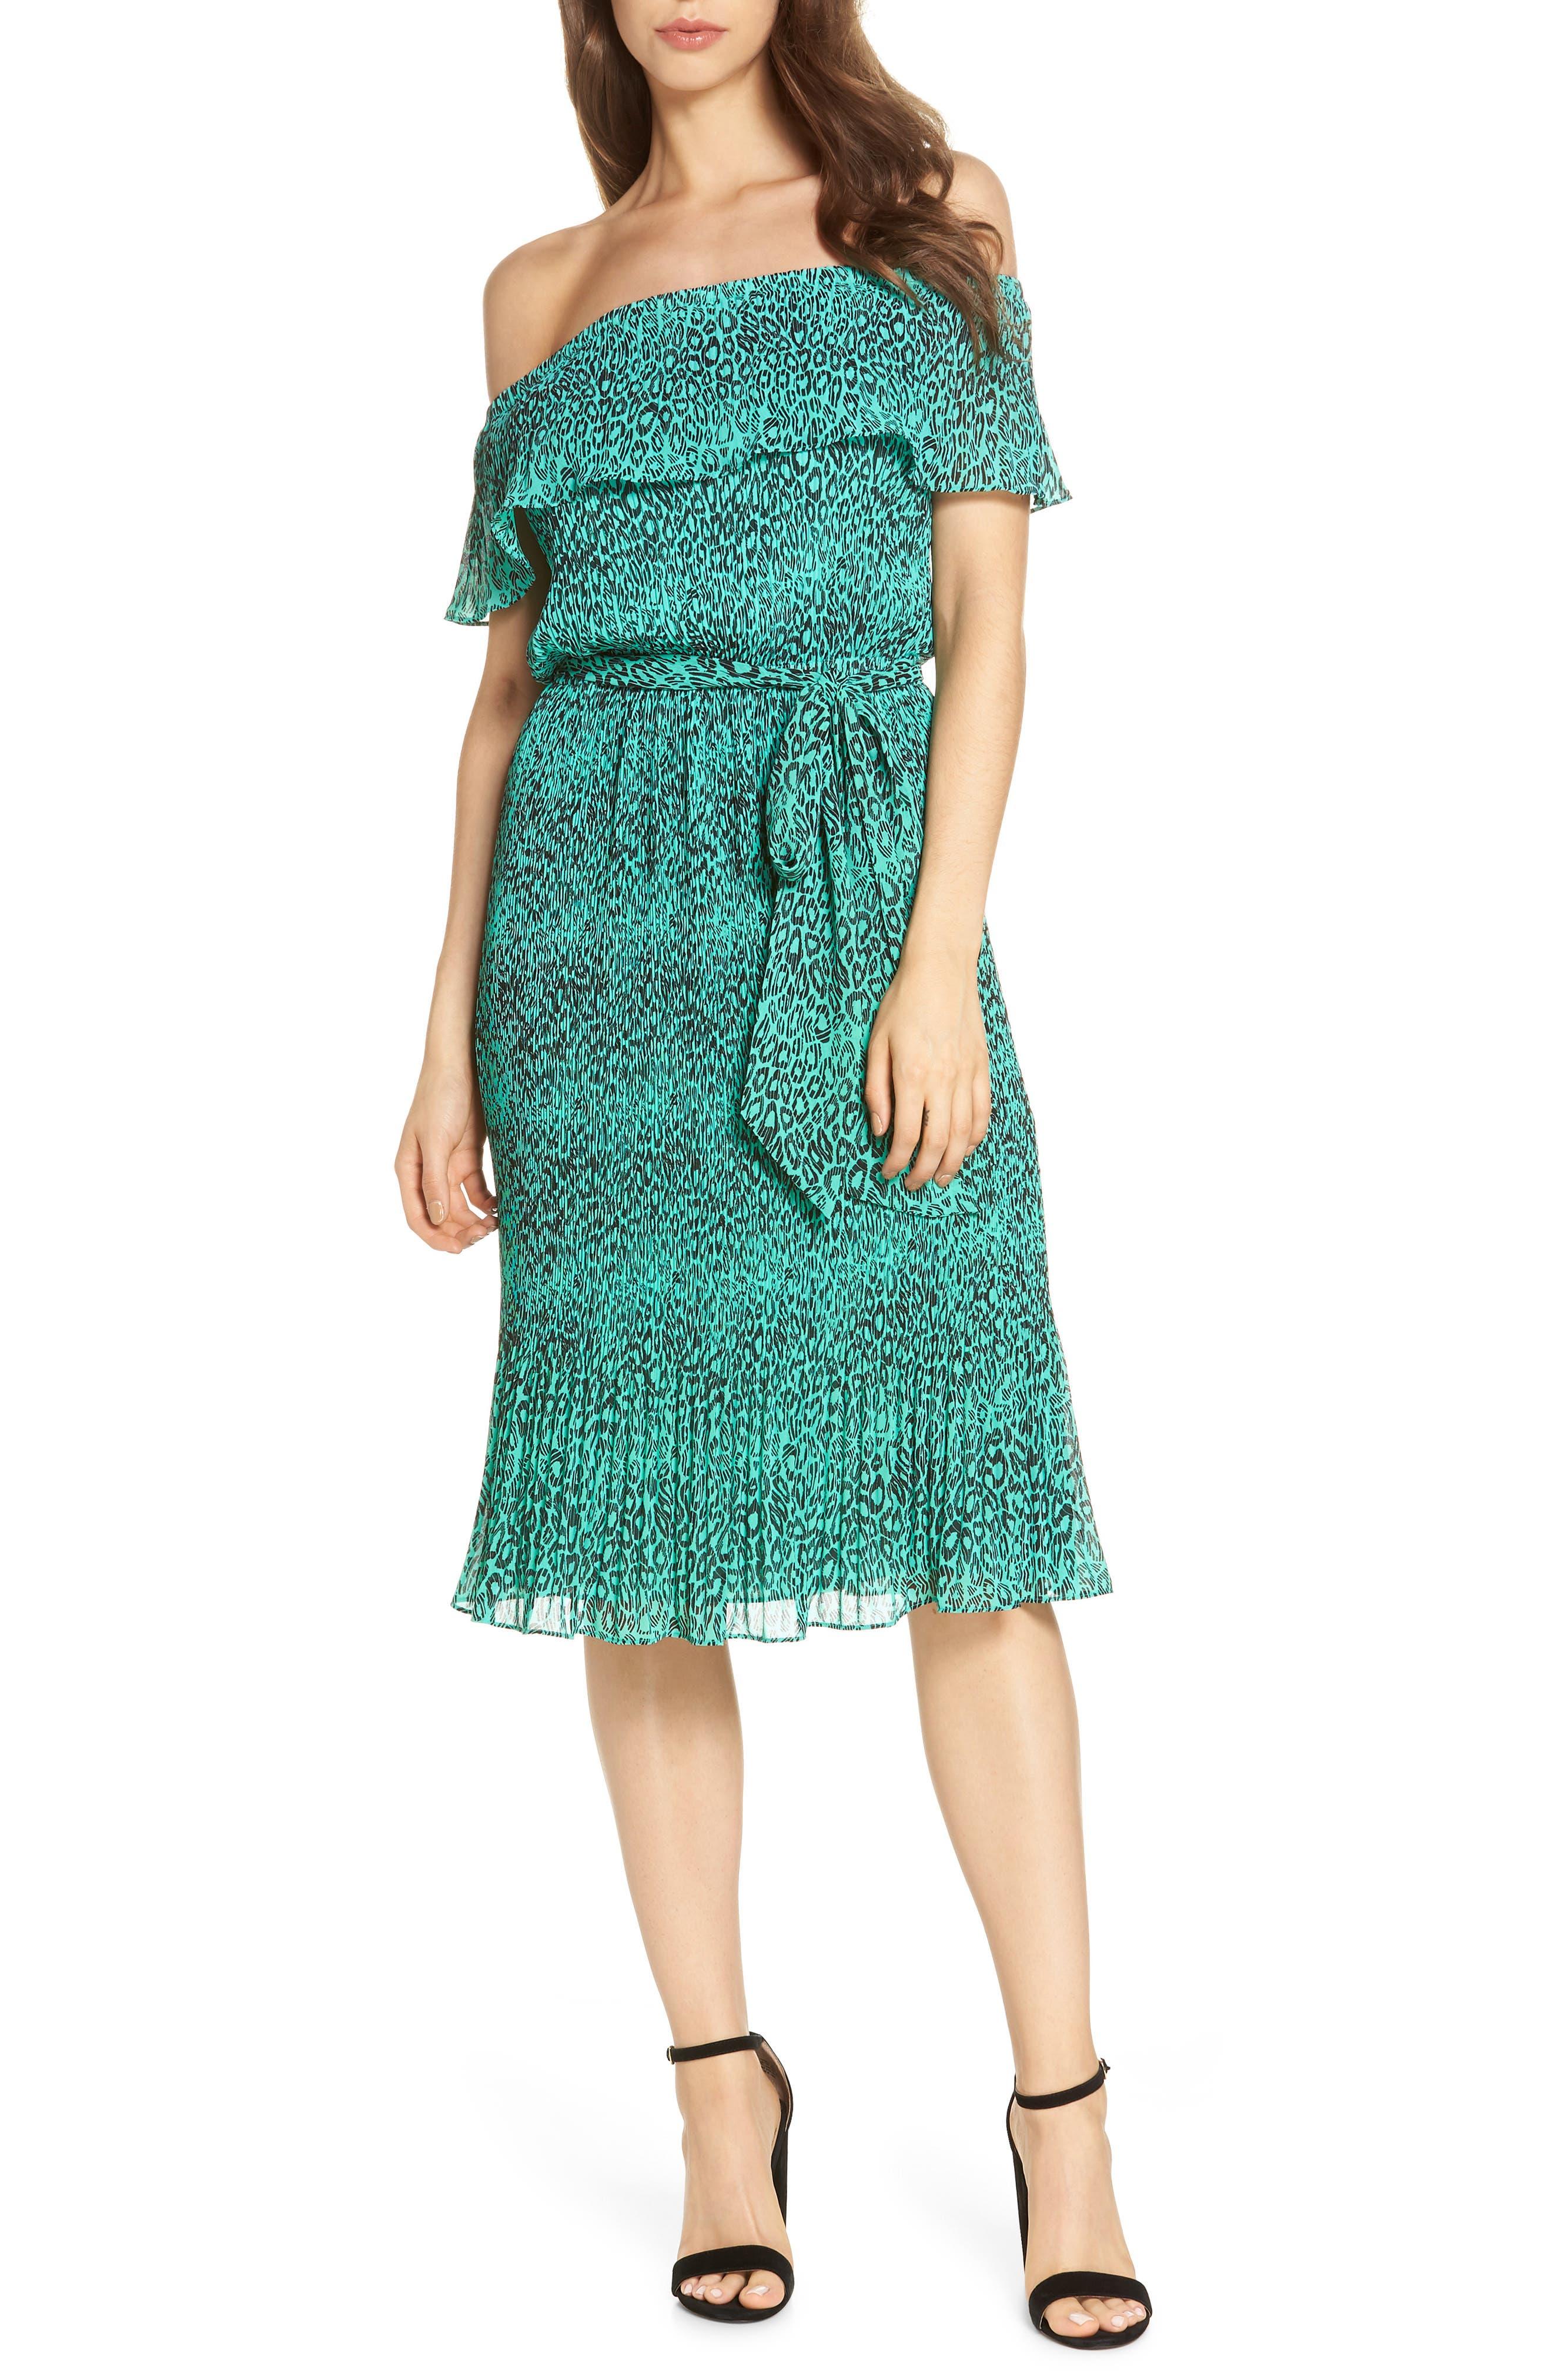 Off the Shoulder Chiffon Midi Dress,                             Main thumbnail 1, color,                             300